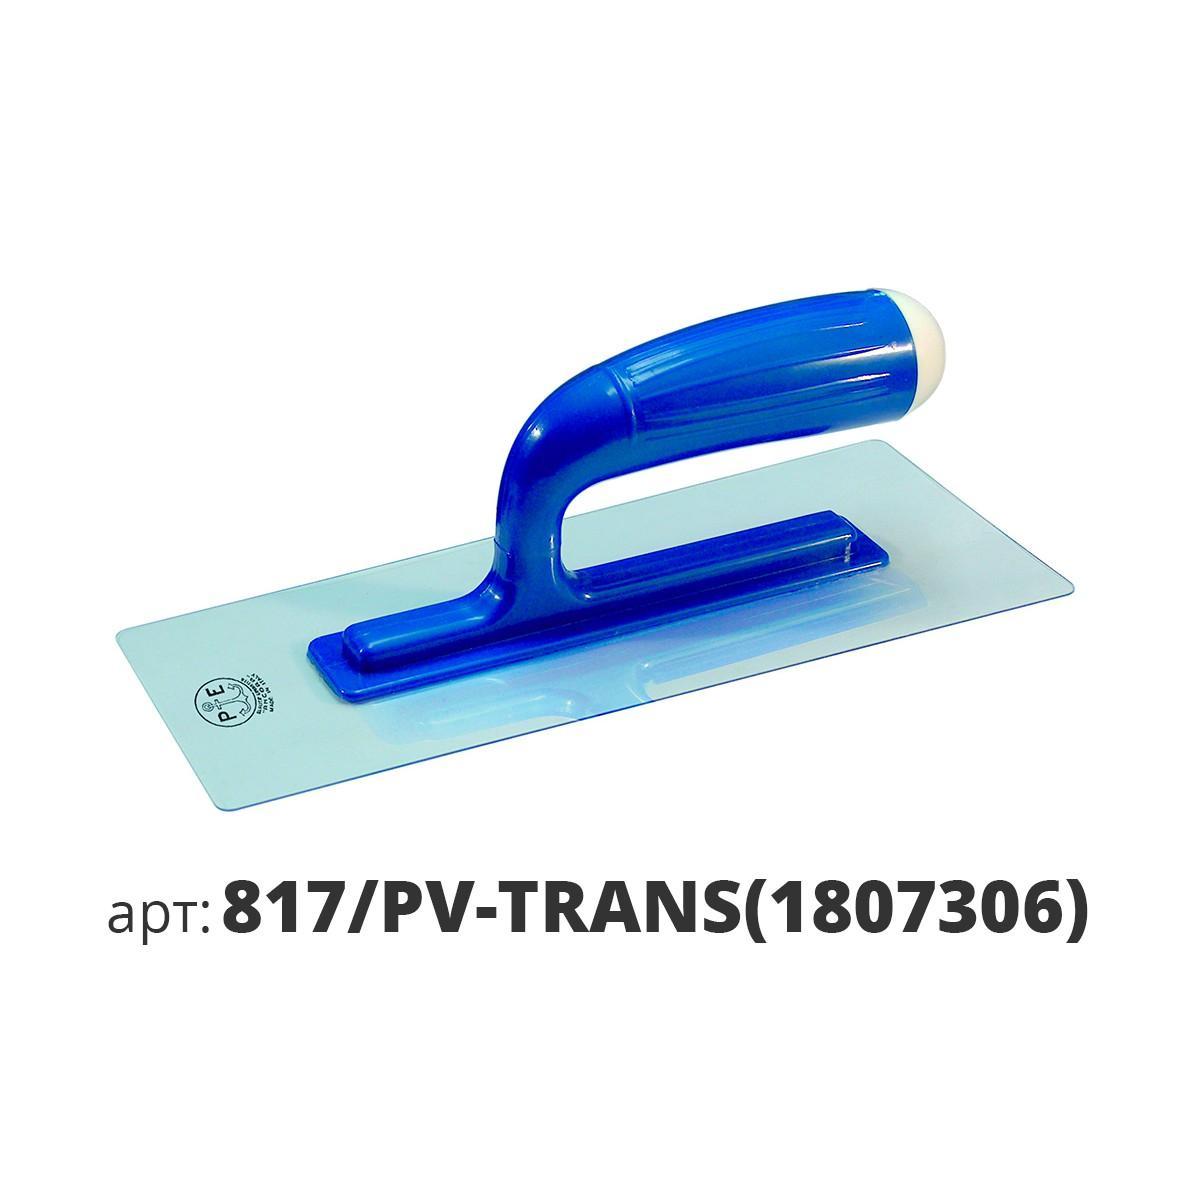 PAVAN кельма пластиковая прозрачная прямоугольная 817/PV-TRANS(1807306)